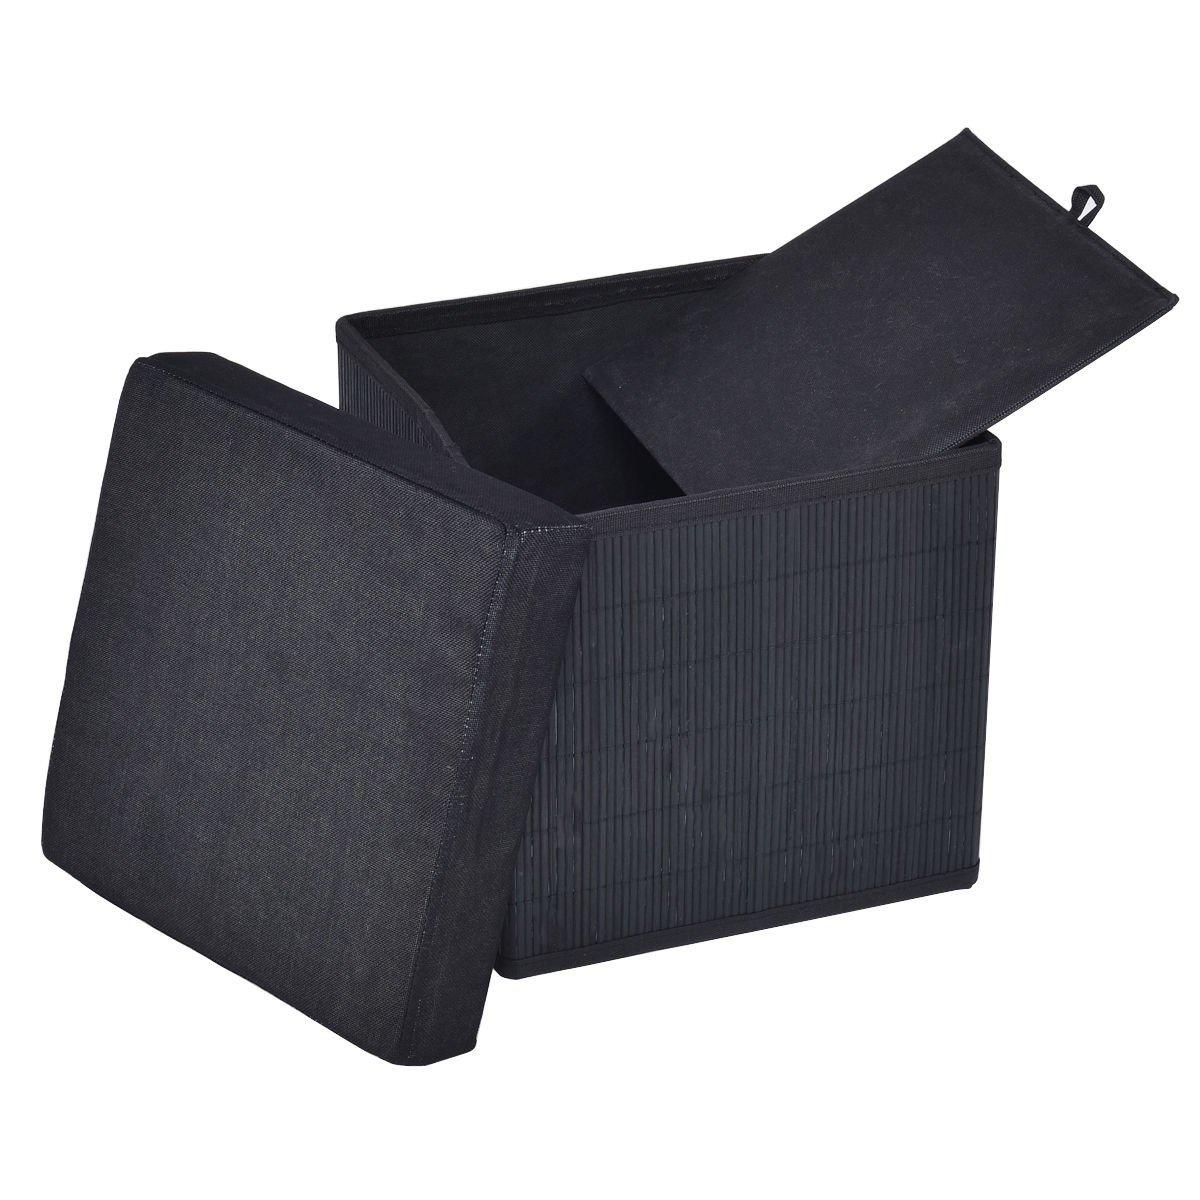 Swell Folding Bamboo Storage Cube Stool Ottoman Inzonedesignstudio Interior Chair Design Inzonedesignstudiocom